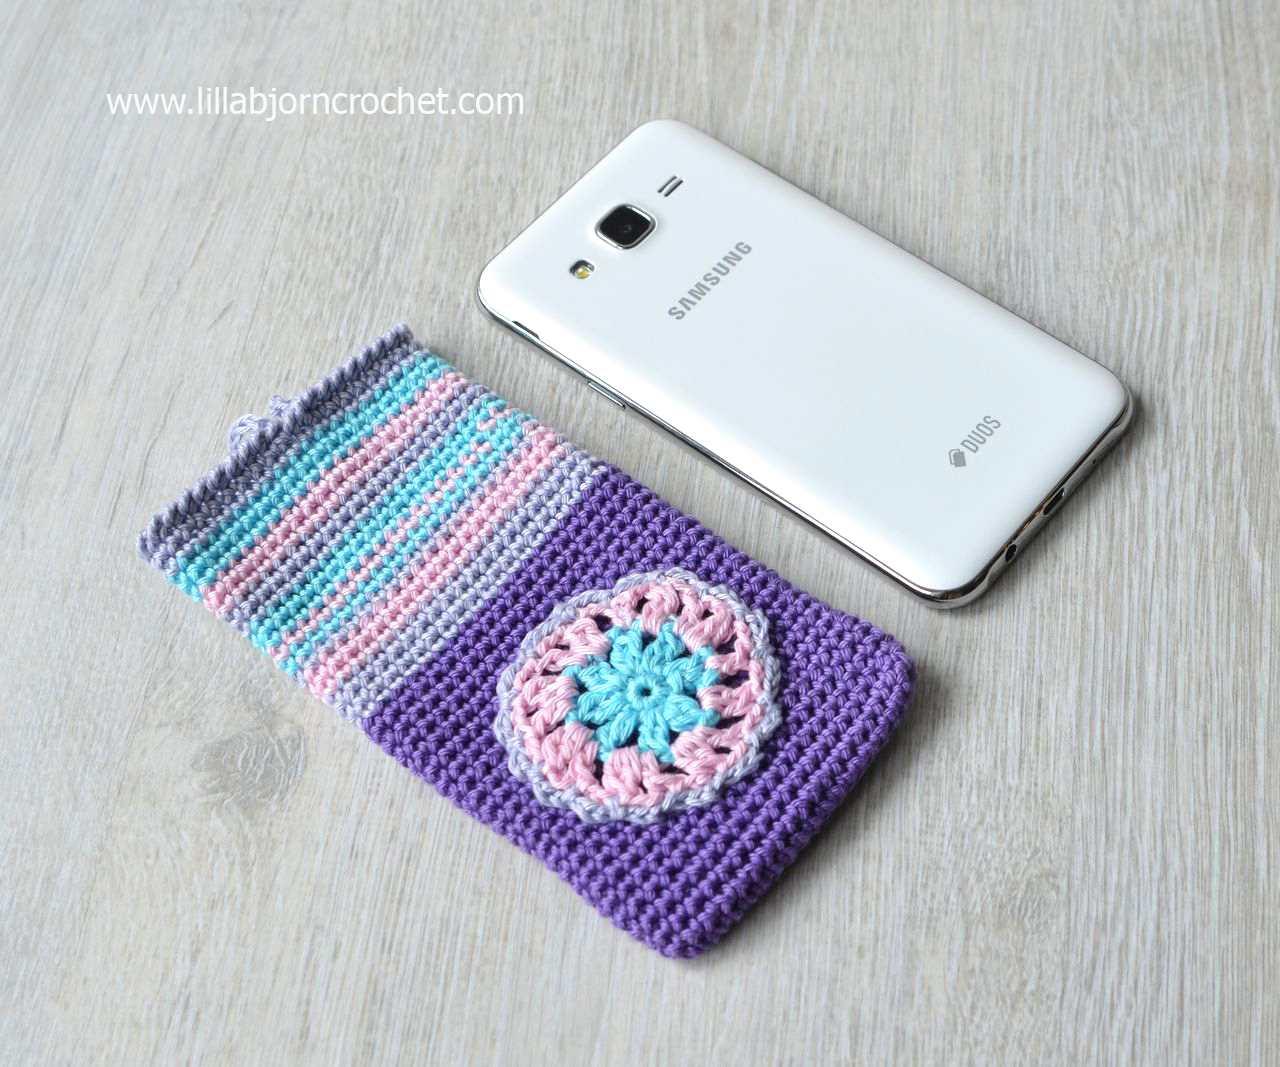 Crochet Cell Phone Cozy Free Pattern